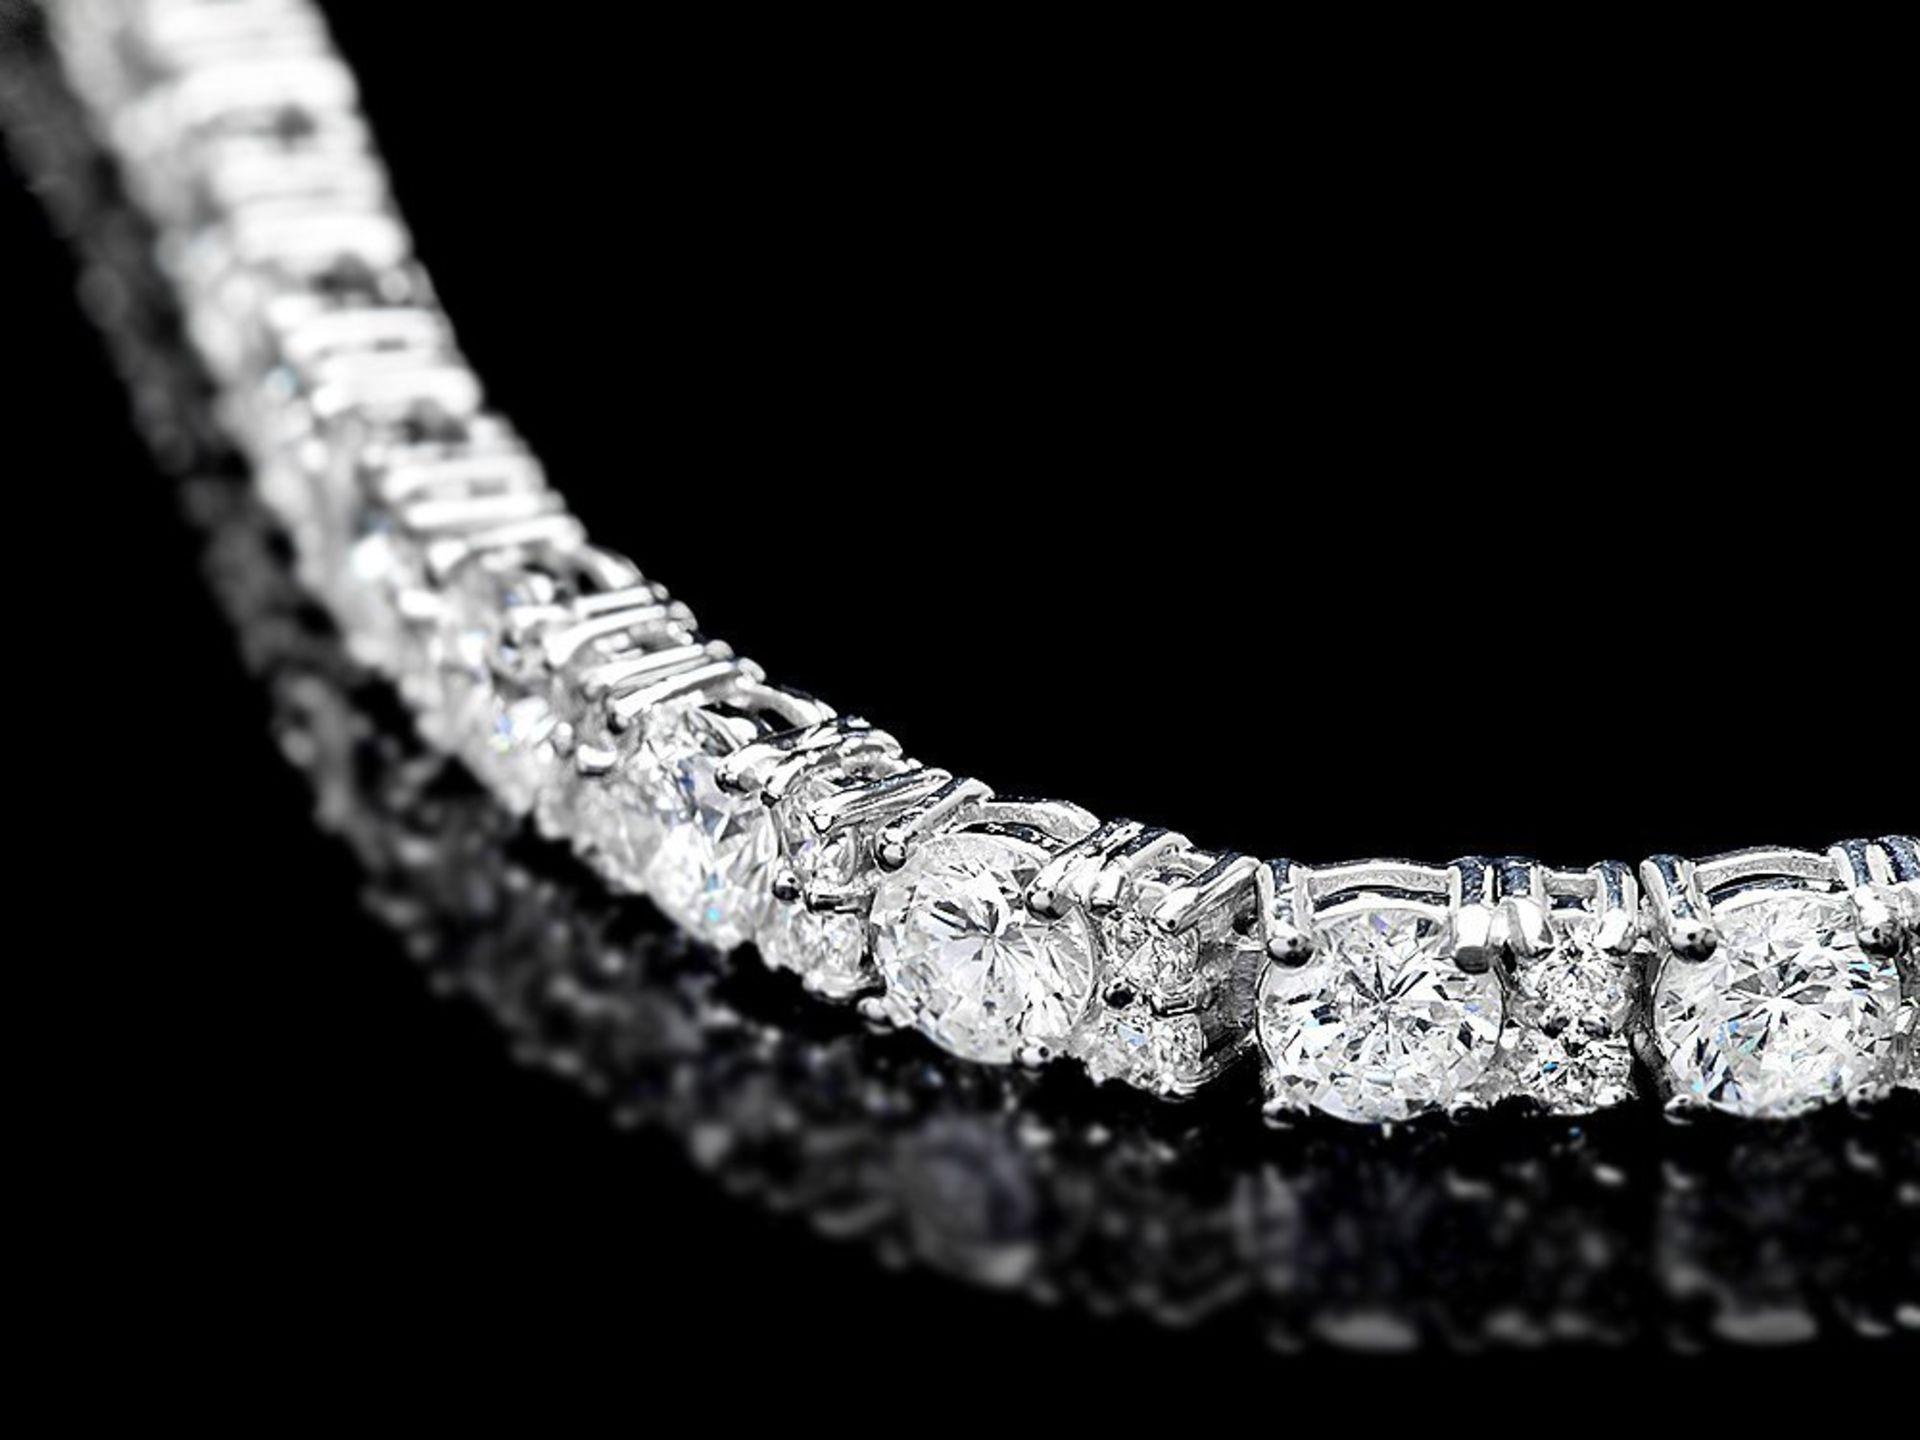 18k White Gold 9.00ct Diamond Bracelet - Image 2 of 4